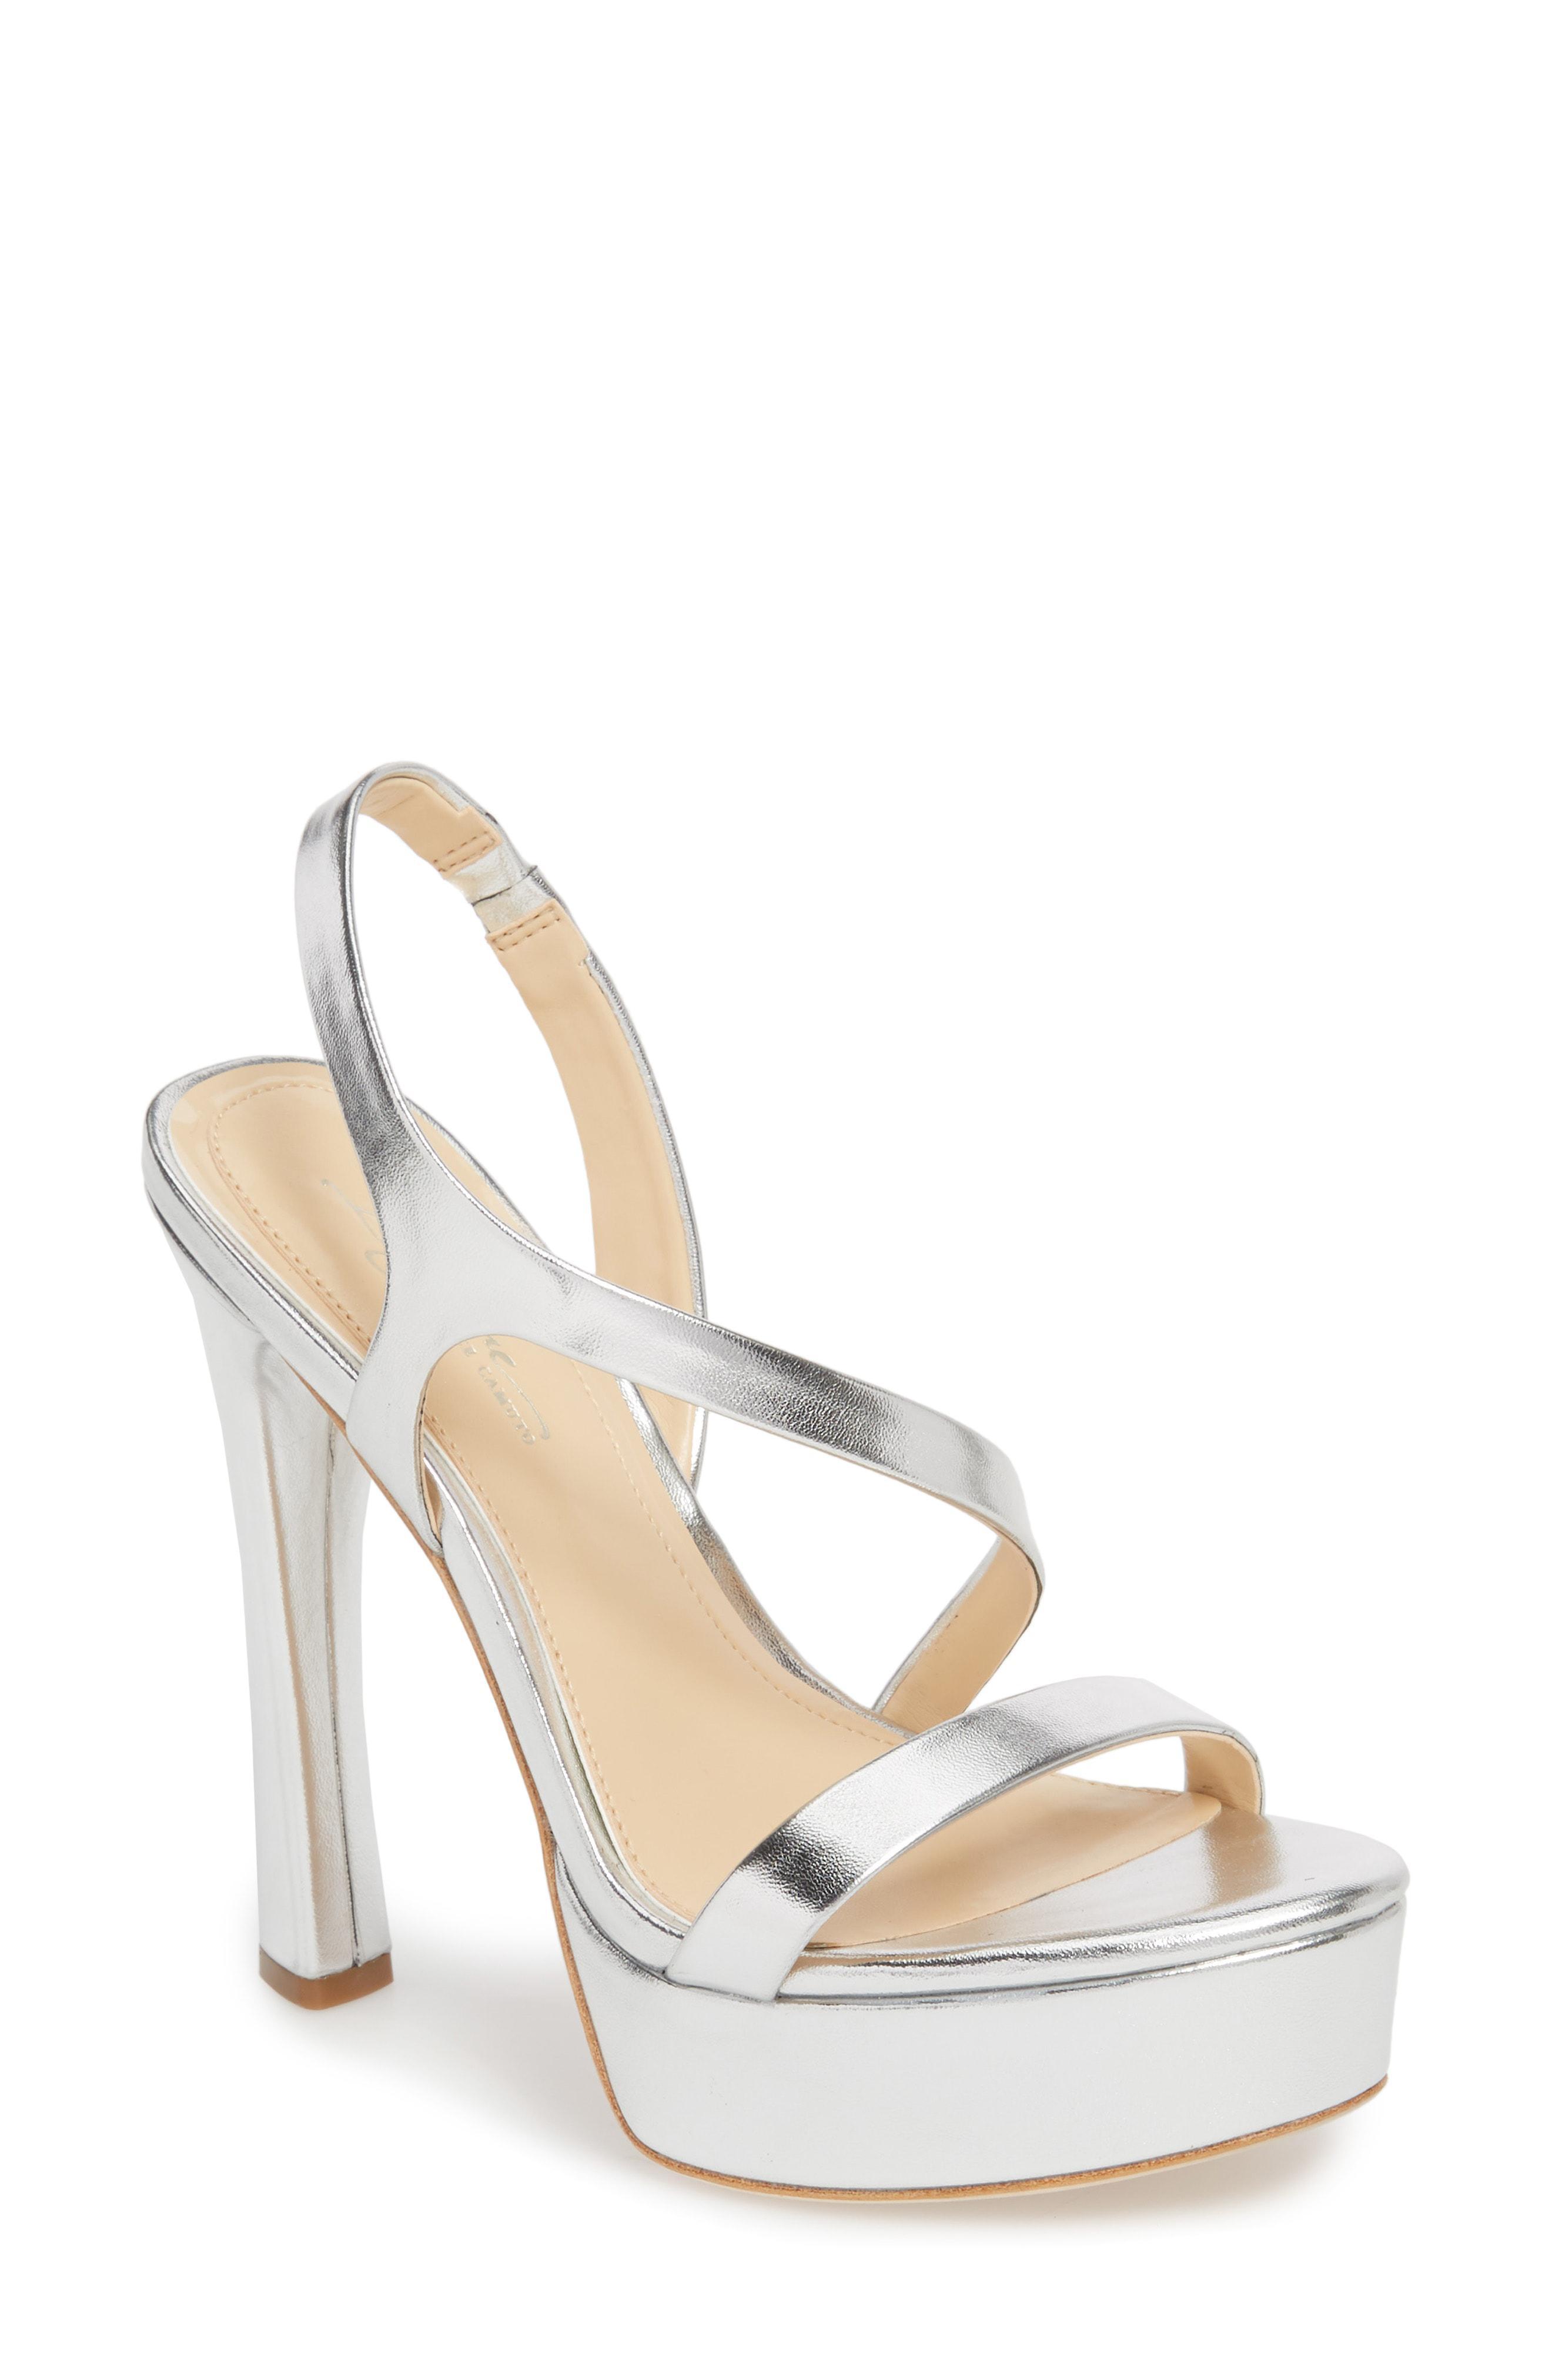 fc6149703618 Lyst - Imagine Vince Camuto Piera Platform Sandal in Metallic